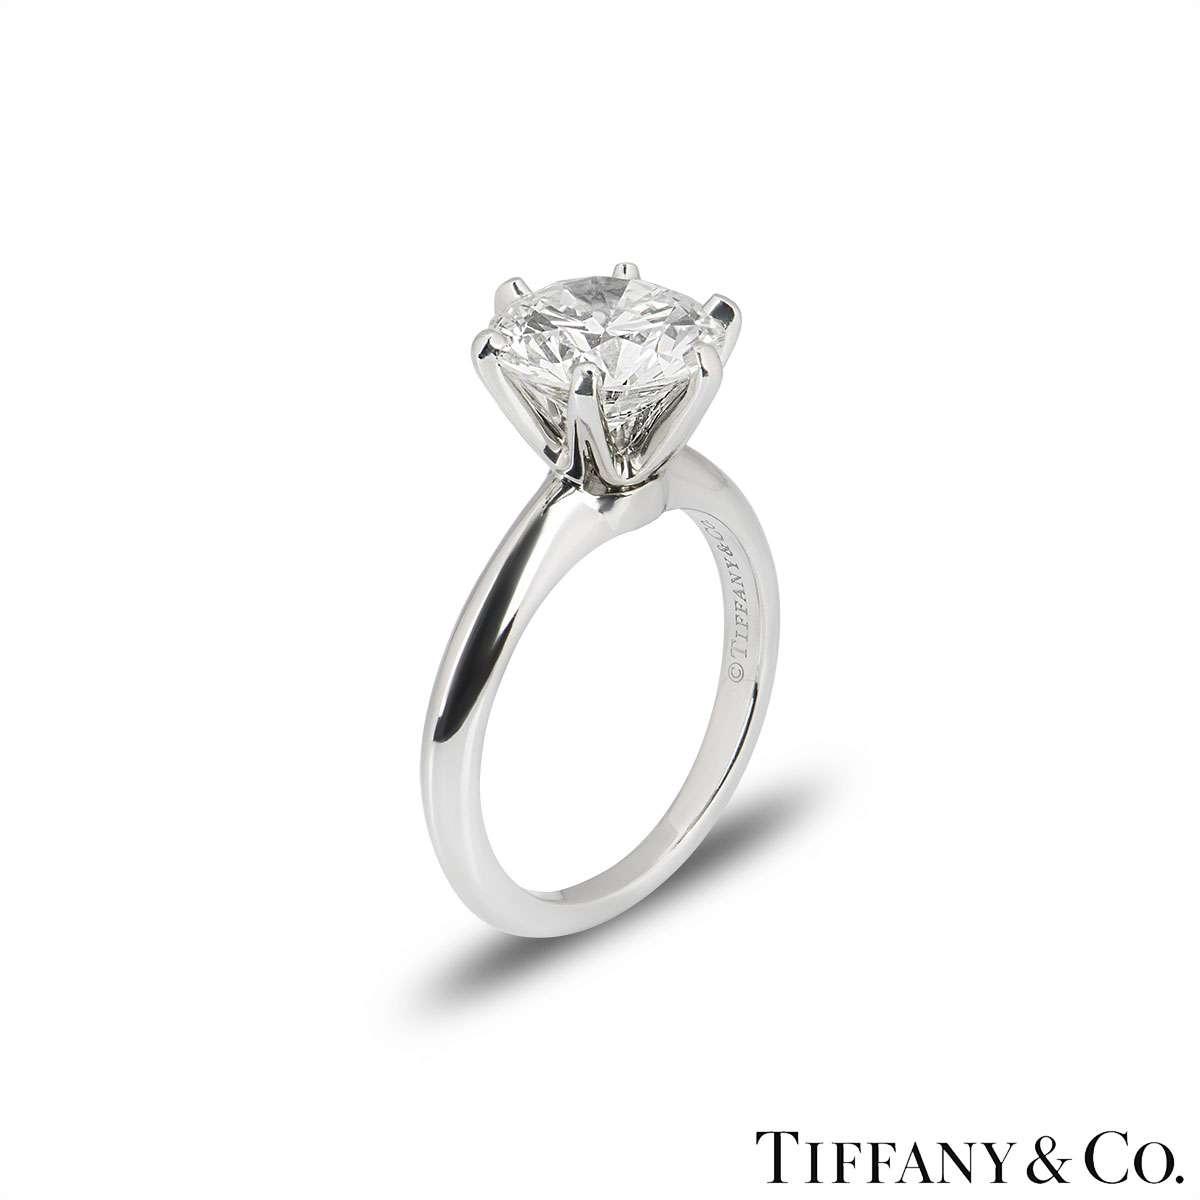 Tiffany & Co. Round Brilliant Cut Diamond Ring 2.80ct I/VVS2